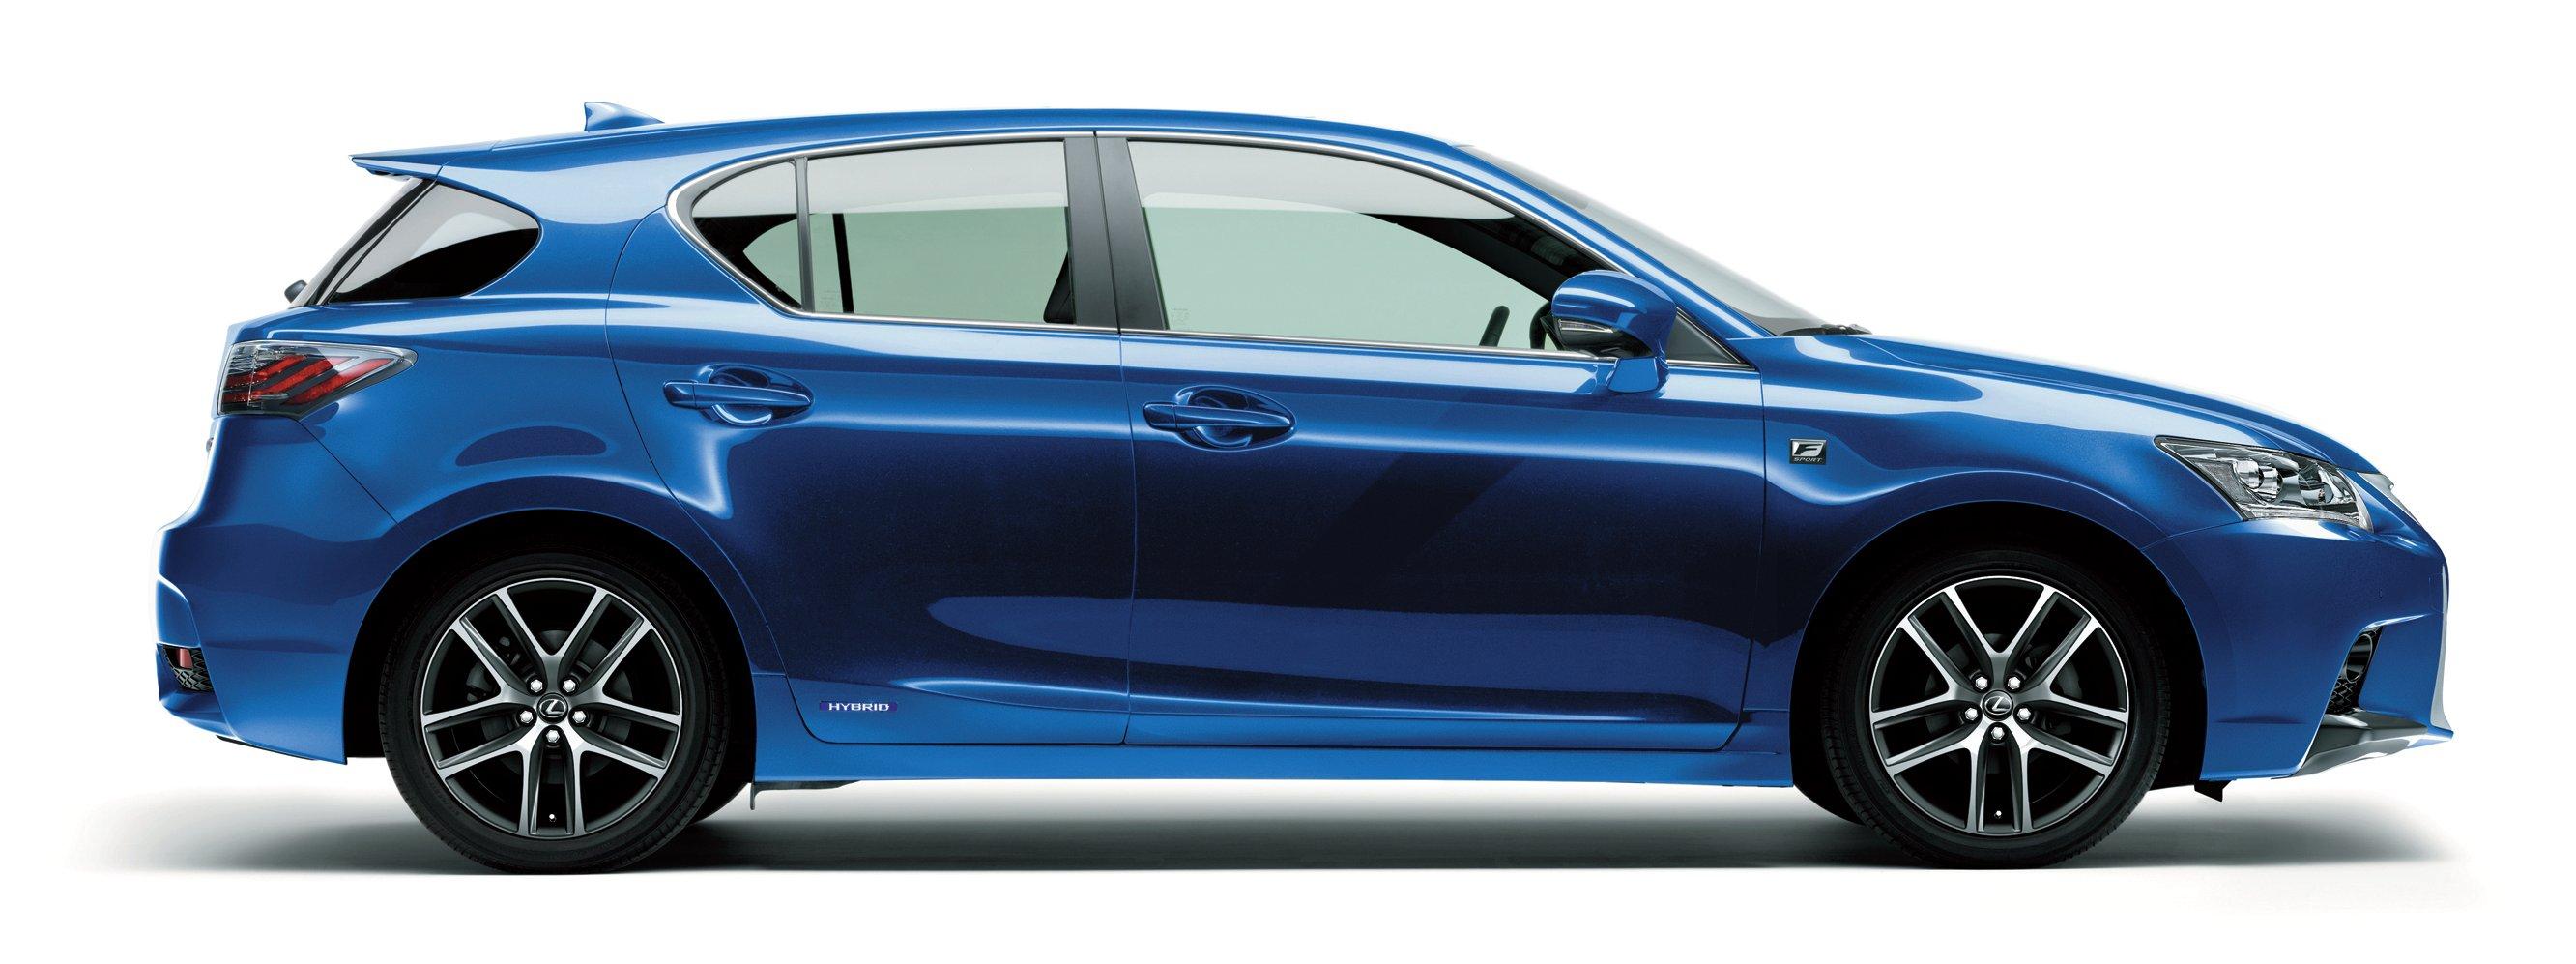 Lexus Is 200 >> 2014 Lexus CT 200h facelift unveiled in Guangzhou Paul Tan - Image 212958